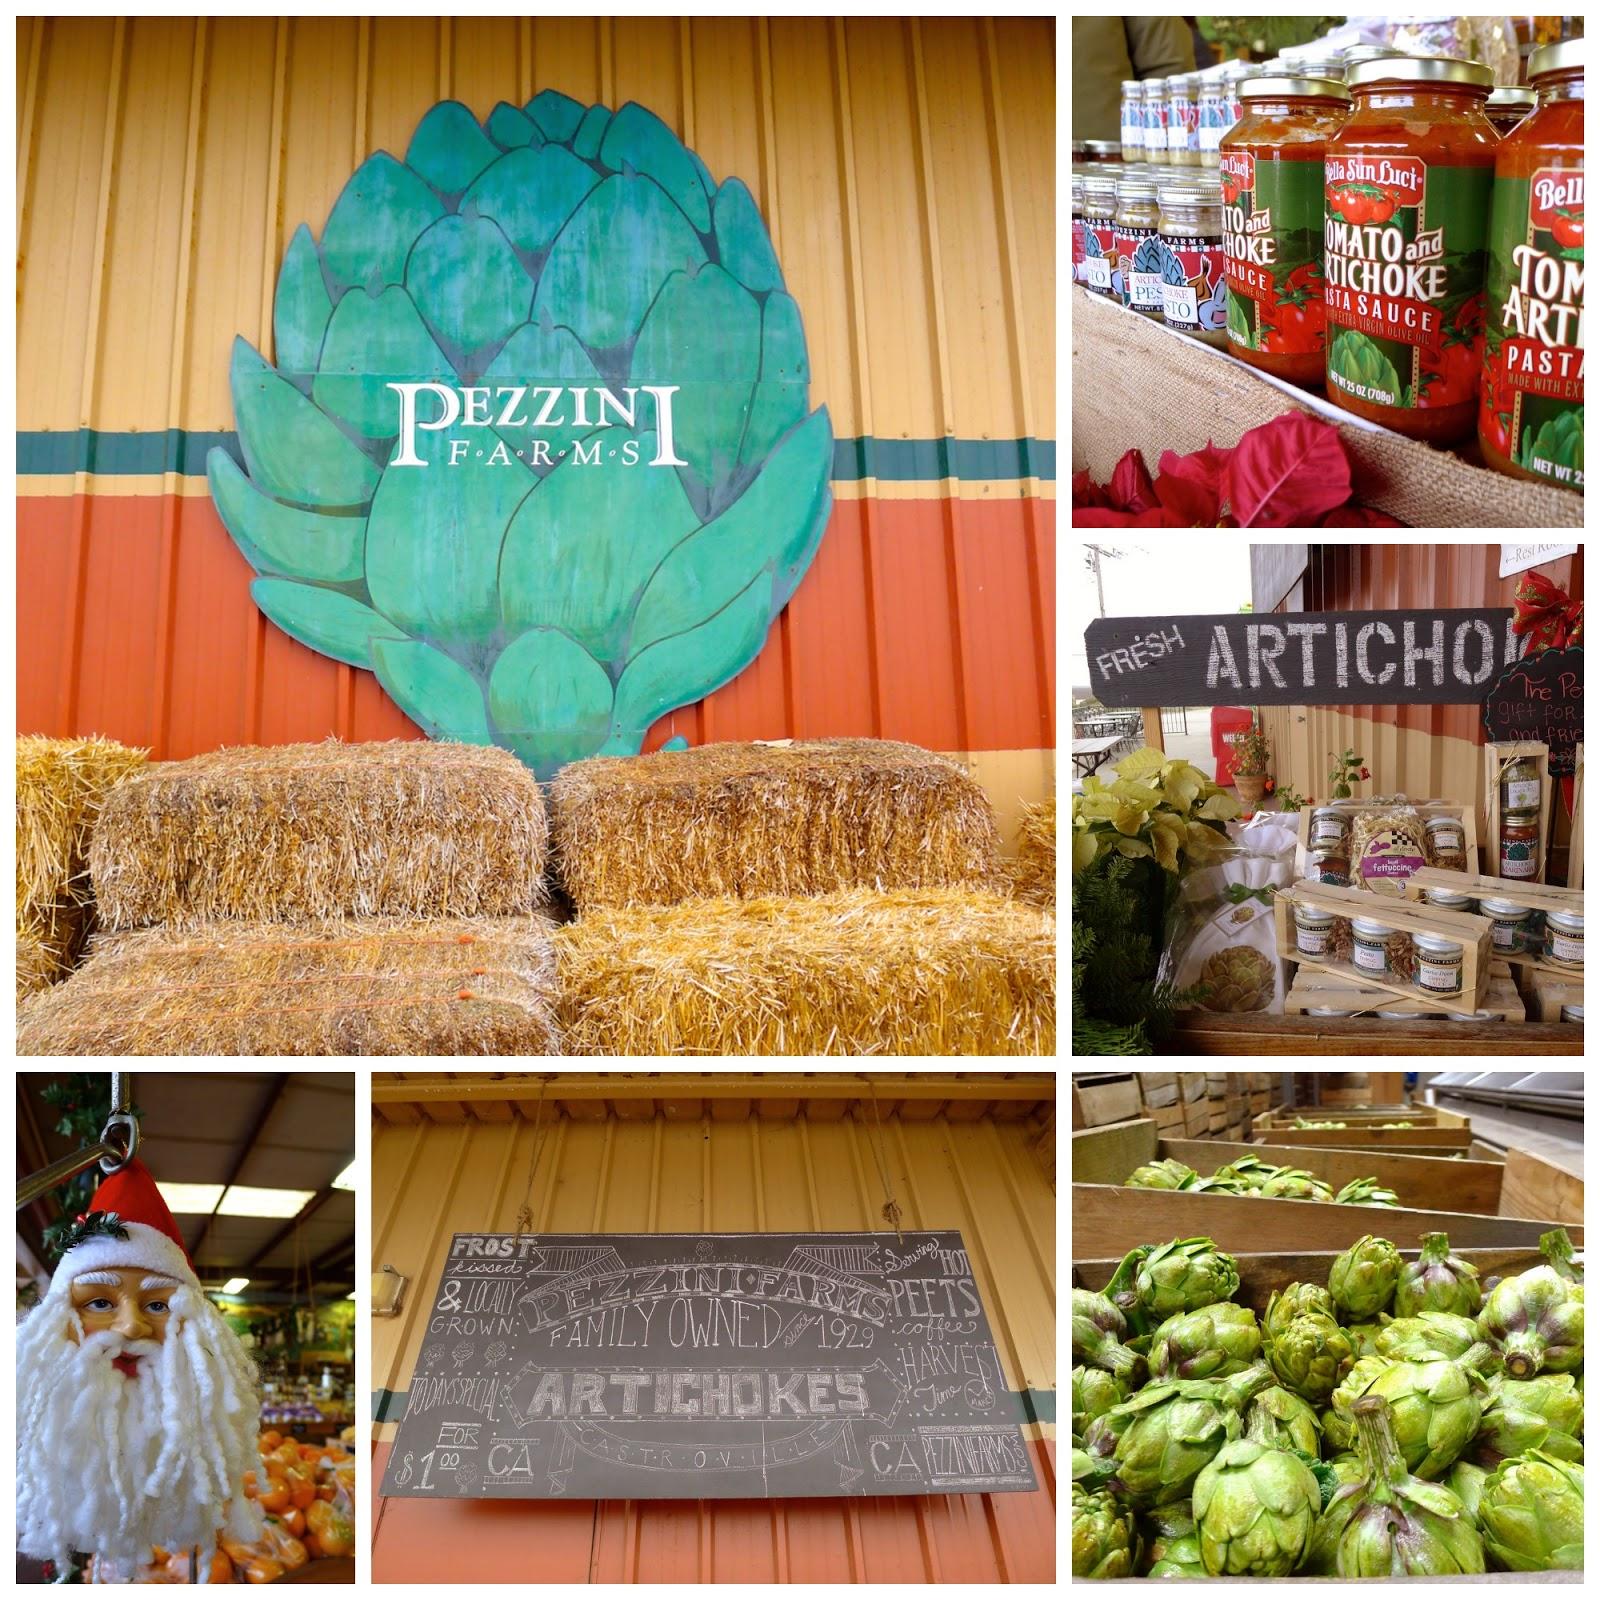 Pezzini+Farms.jpg